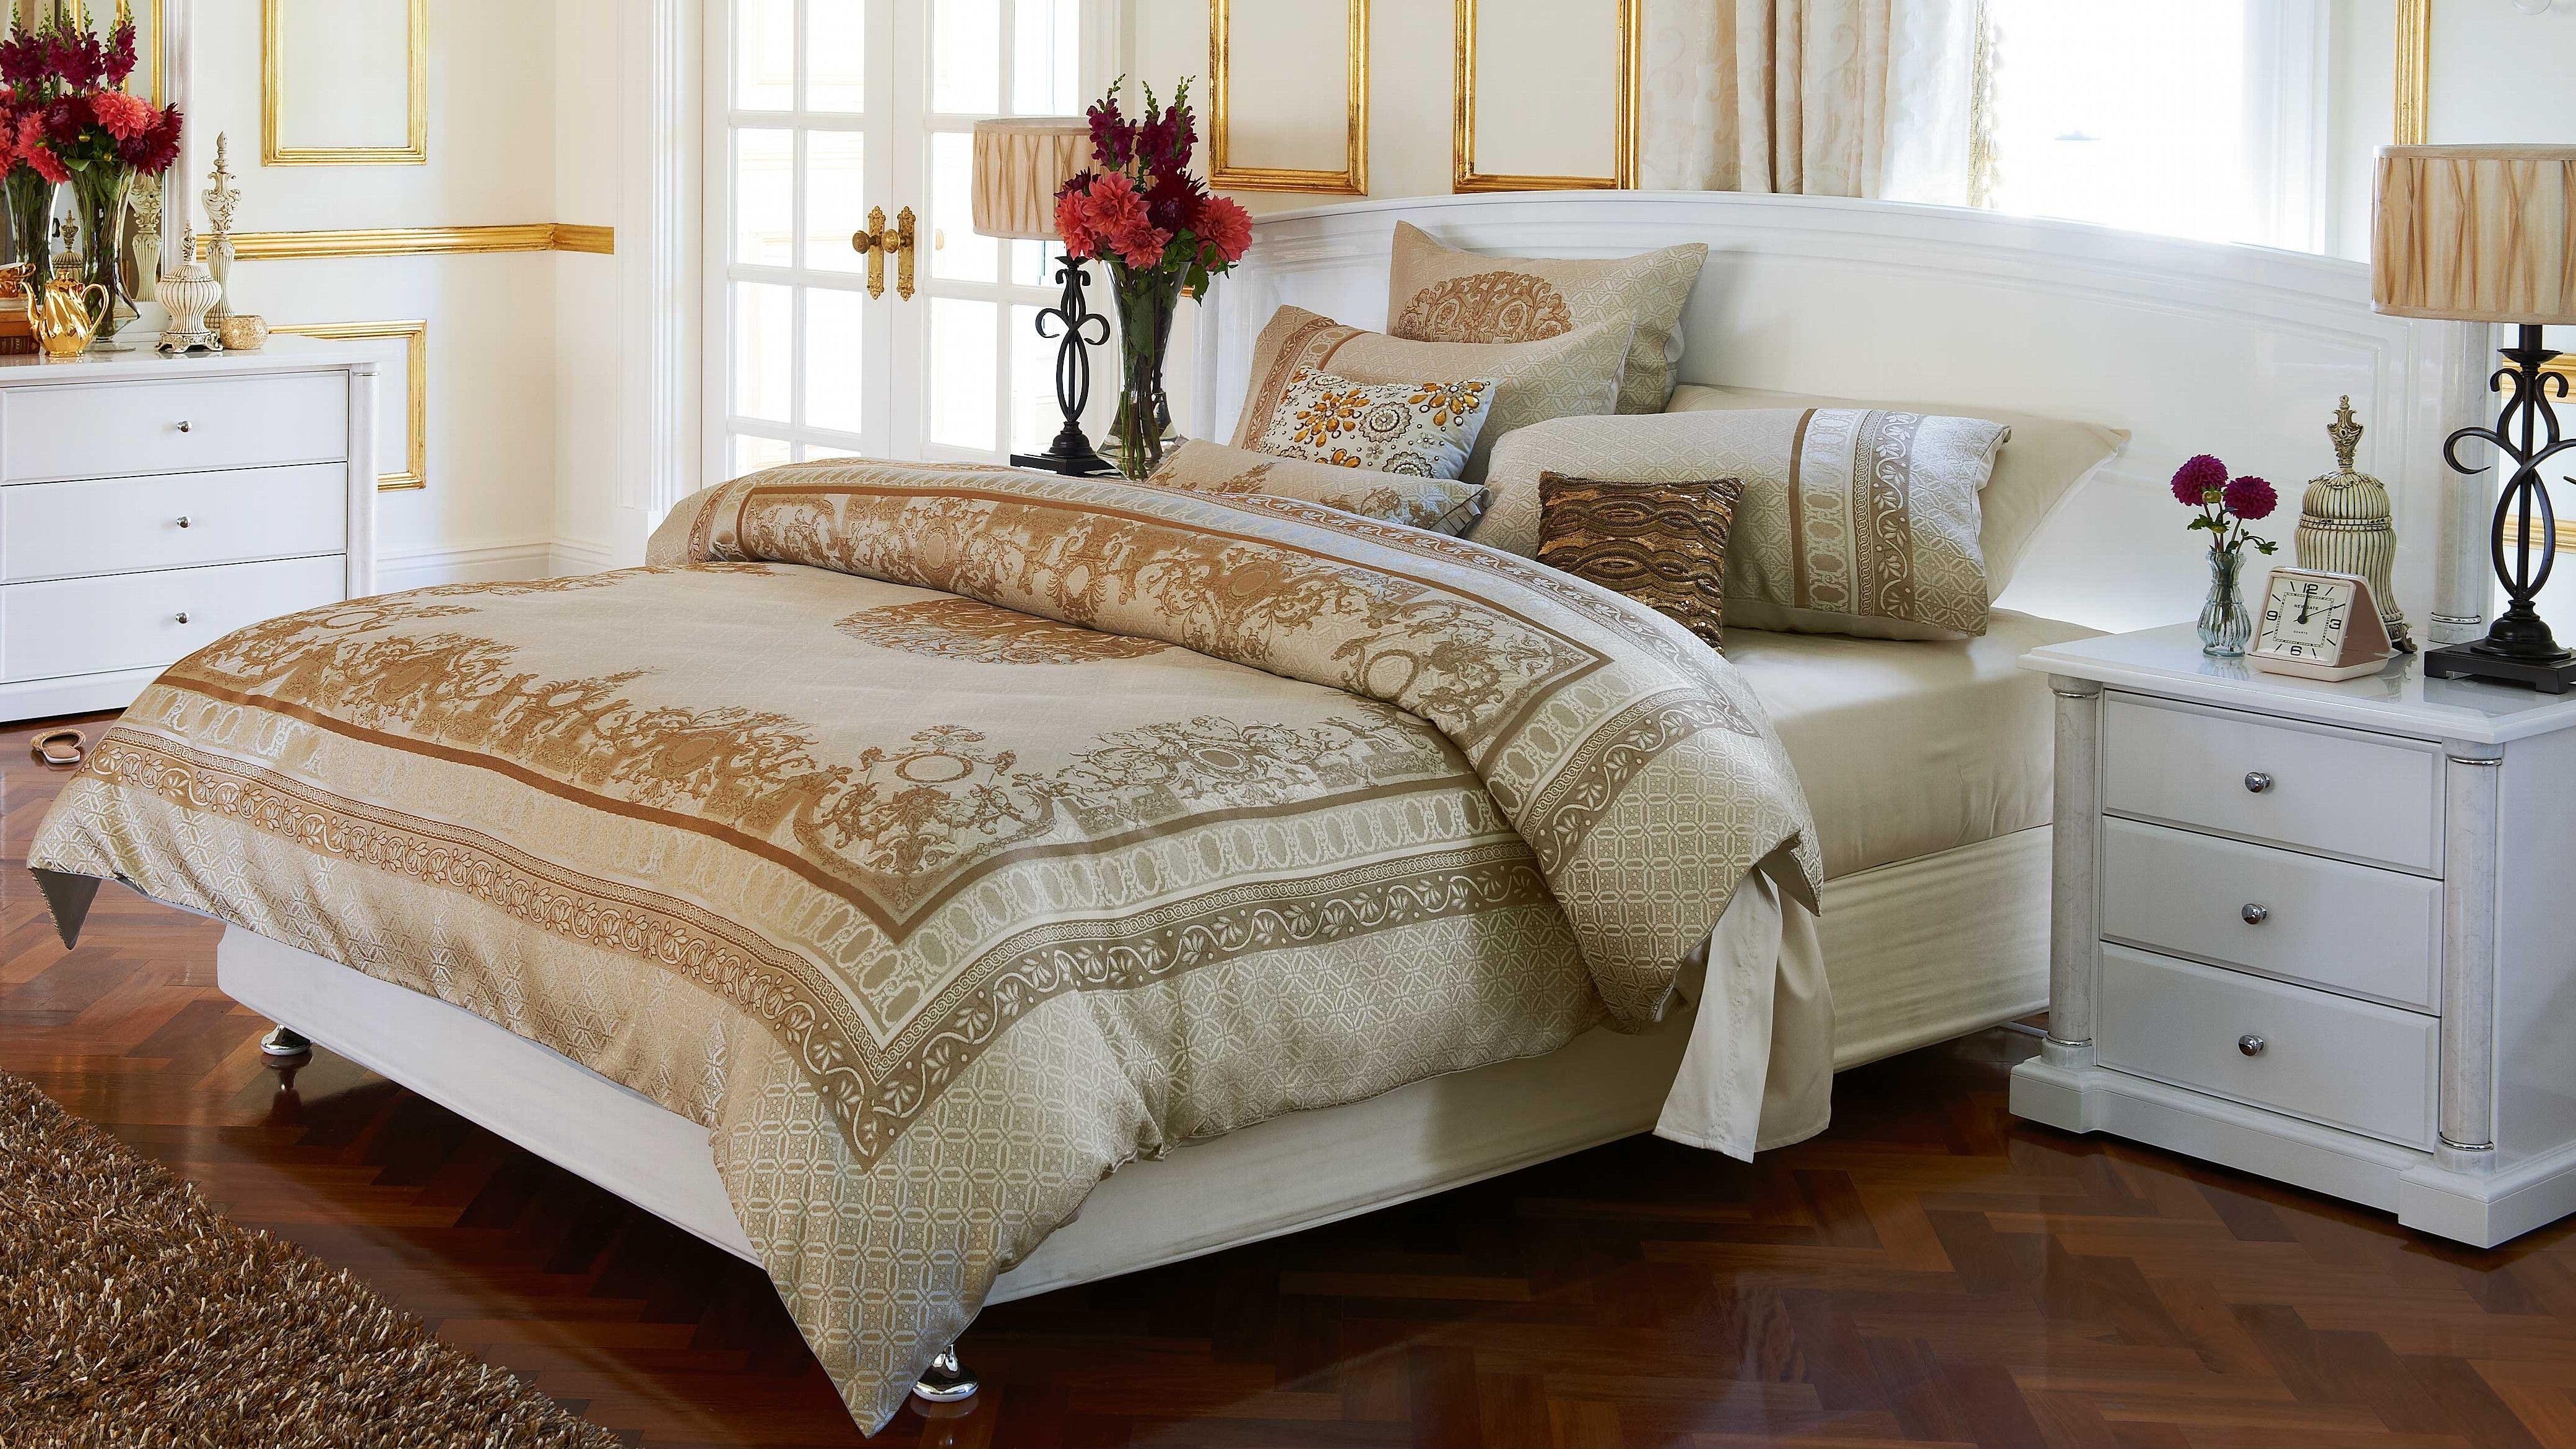 Corinthian 3 Piece Bedroom Suite from Harvey Norman | furniture ...